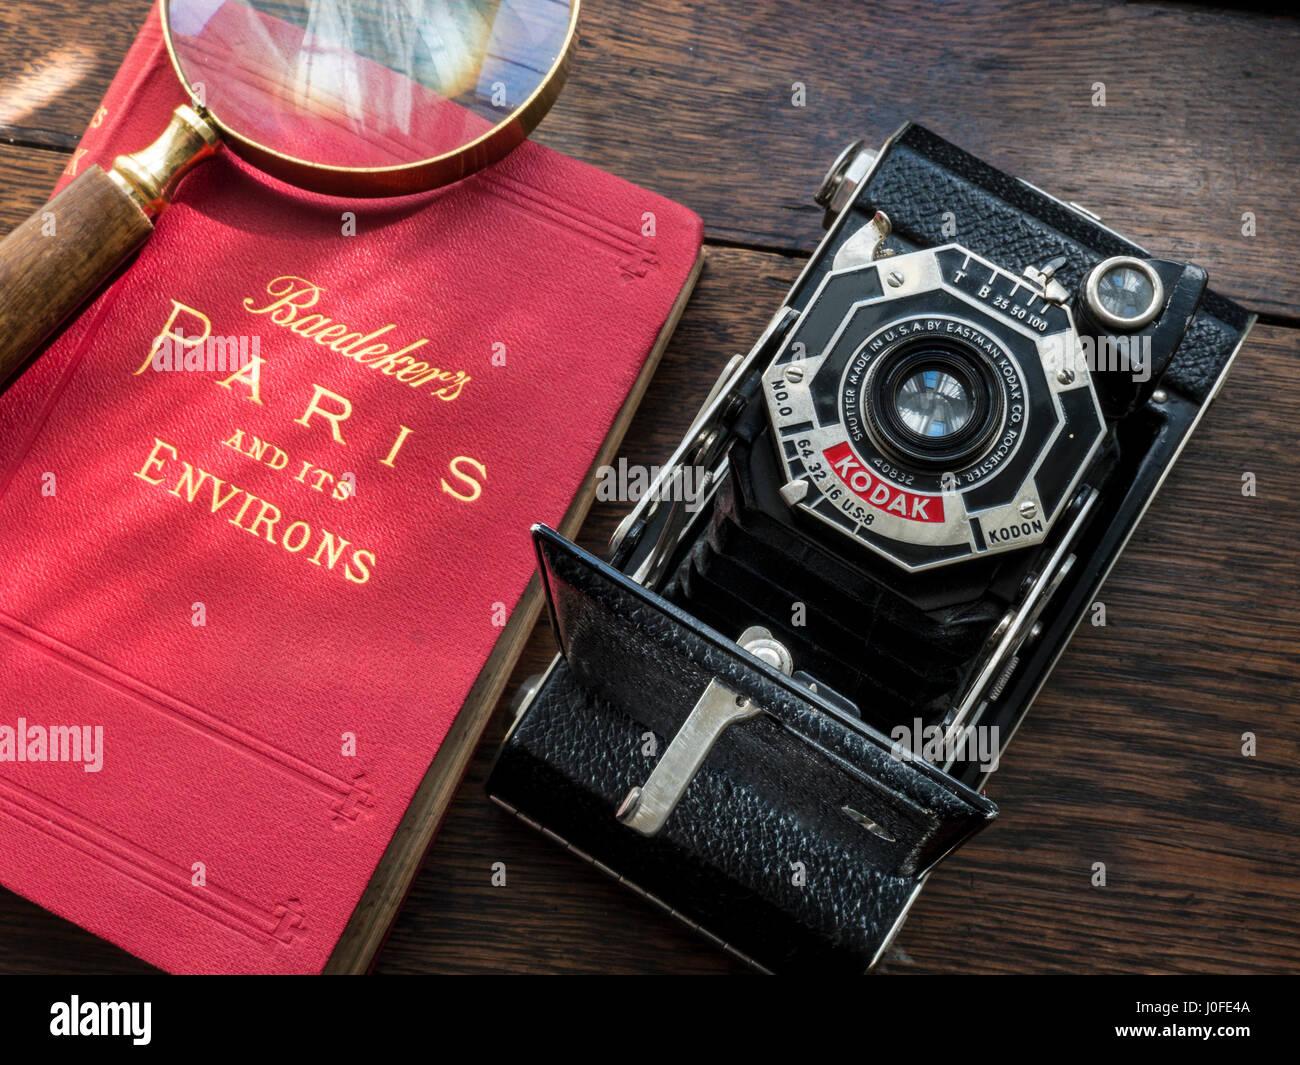 Vintage 1930's Art Deco Kodak 620 film camera with antiquarian 1930's Baedekers Paris map guide book - Stock Image